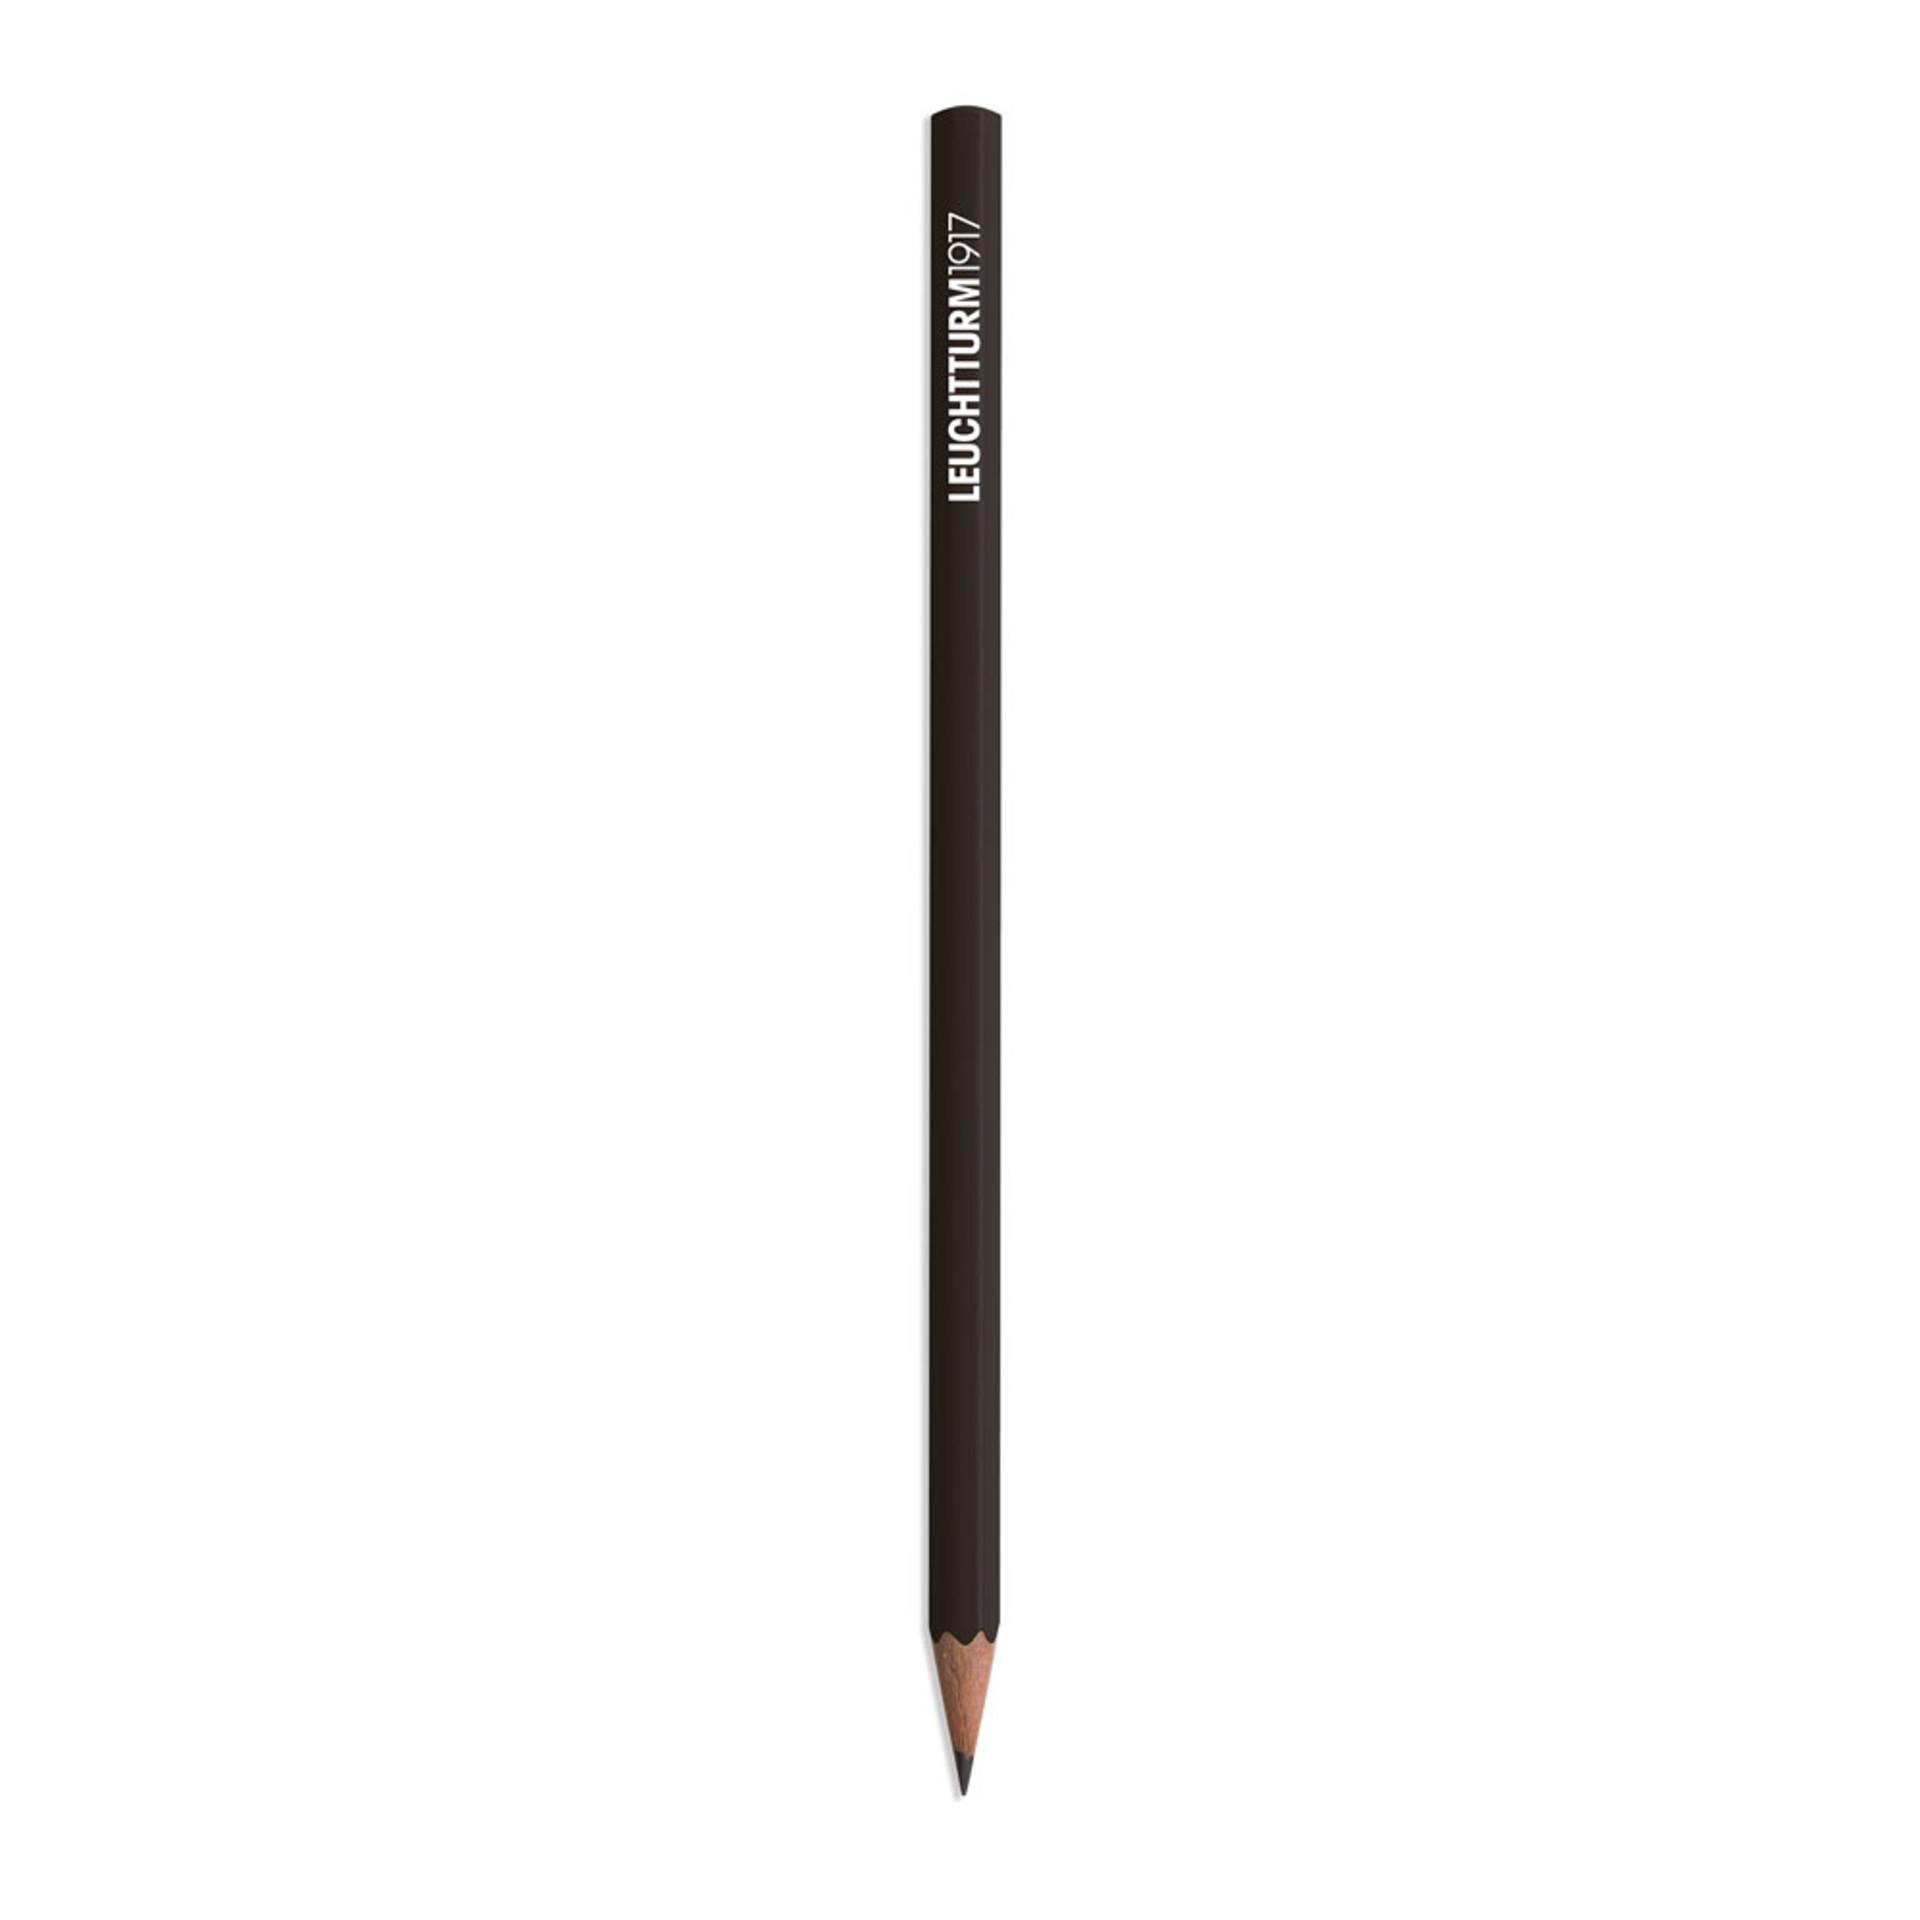 Leuchtturm 1917 Black HB Lead Woodcase Pencil – Black